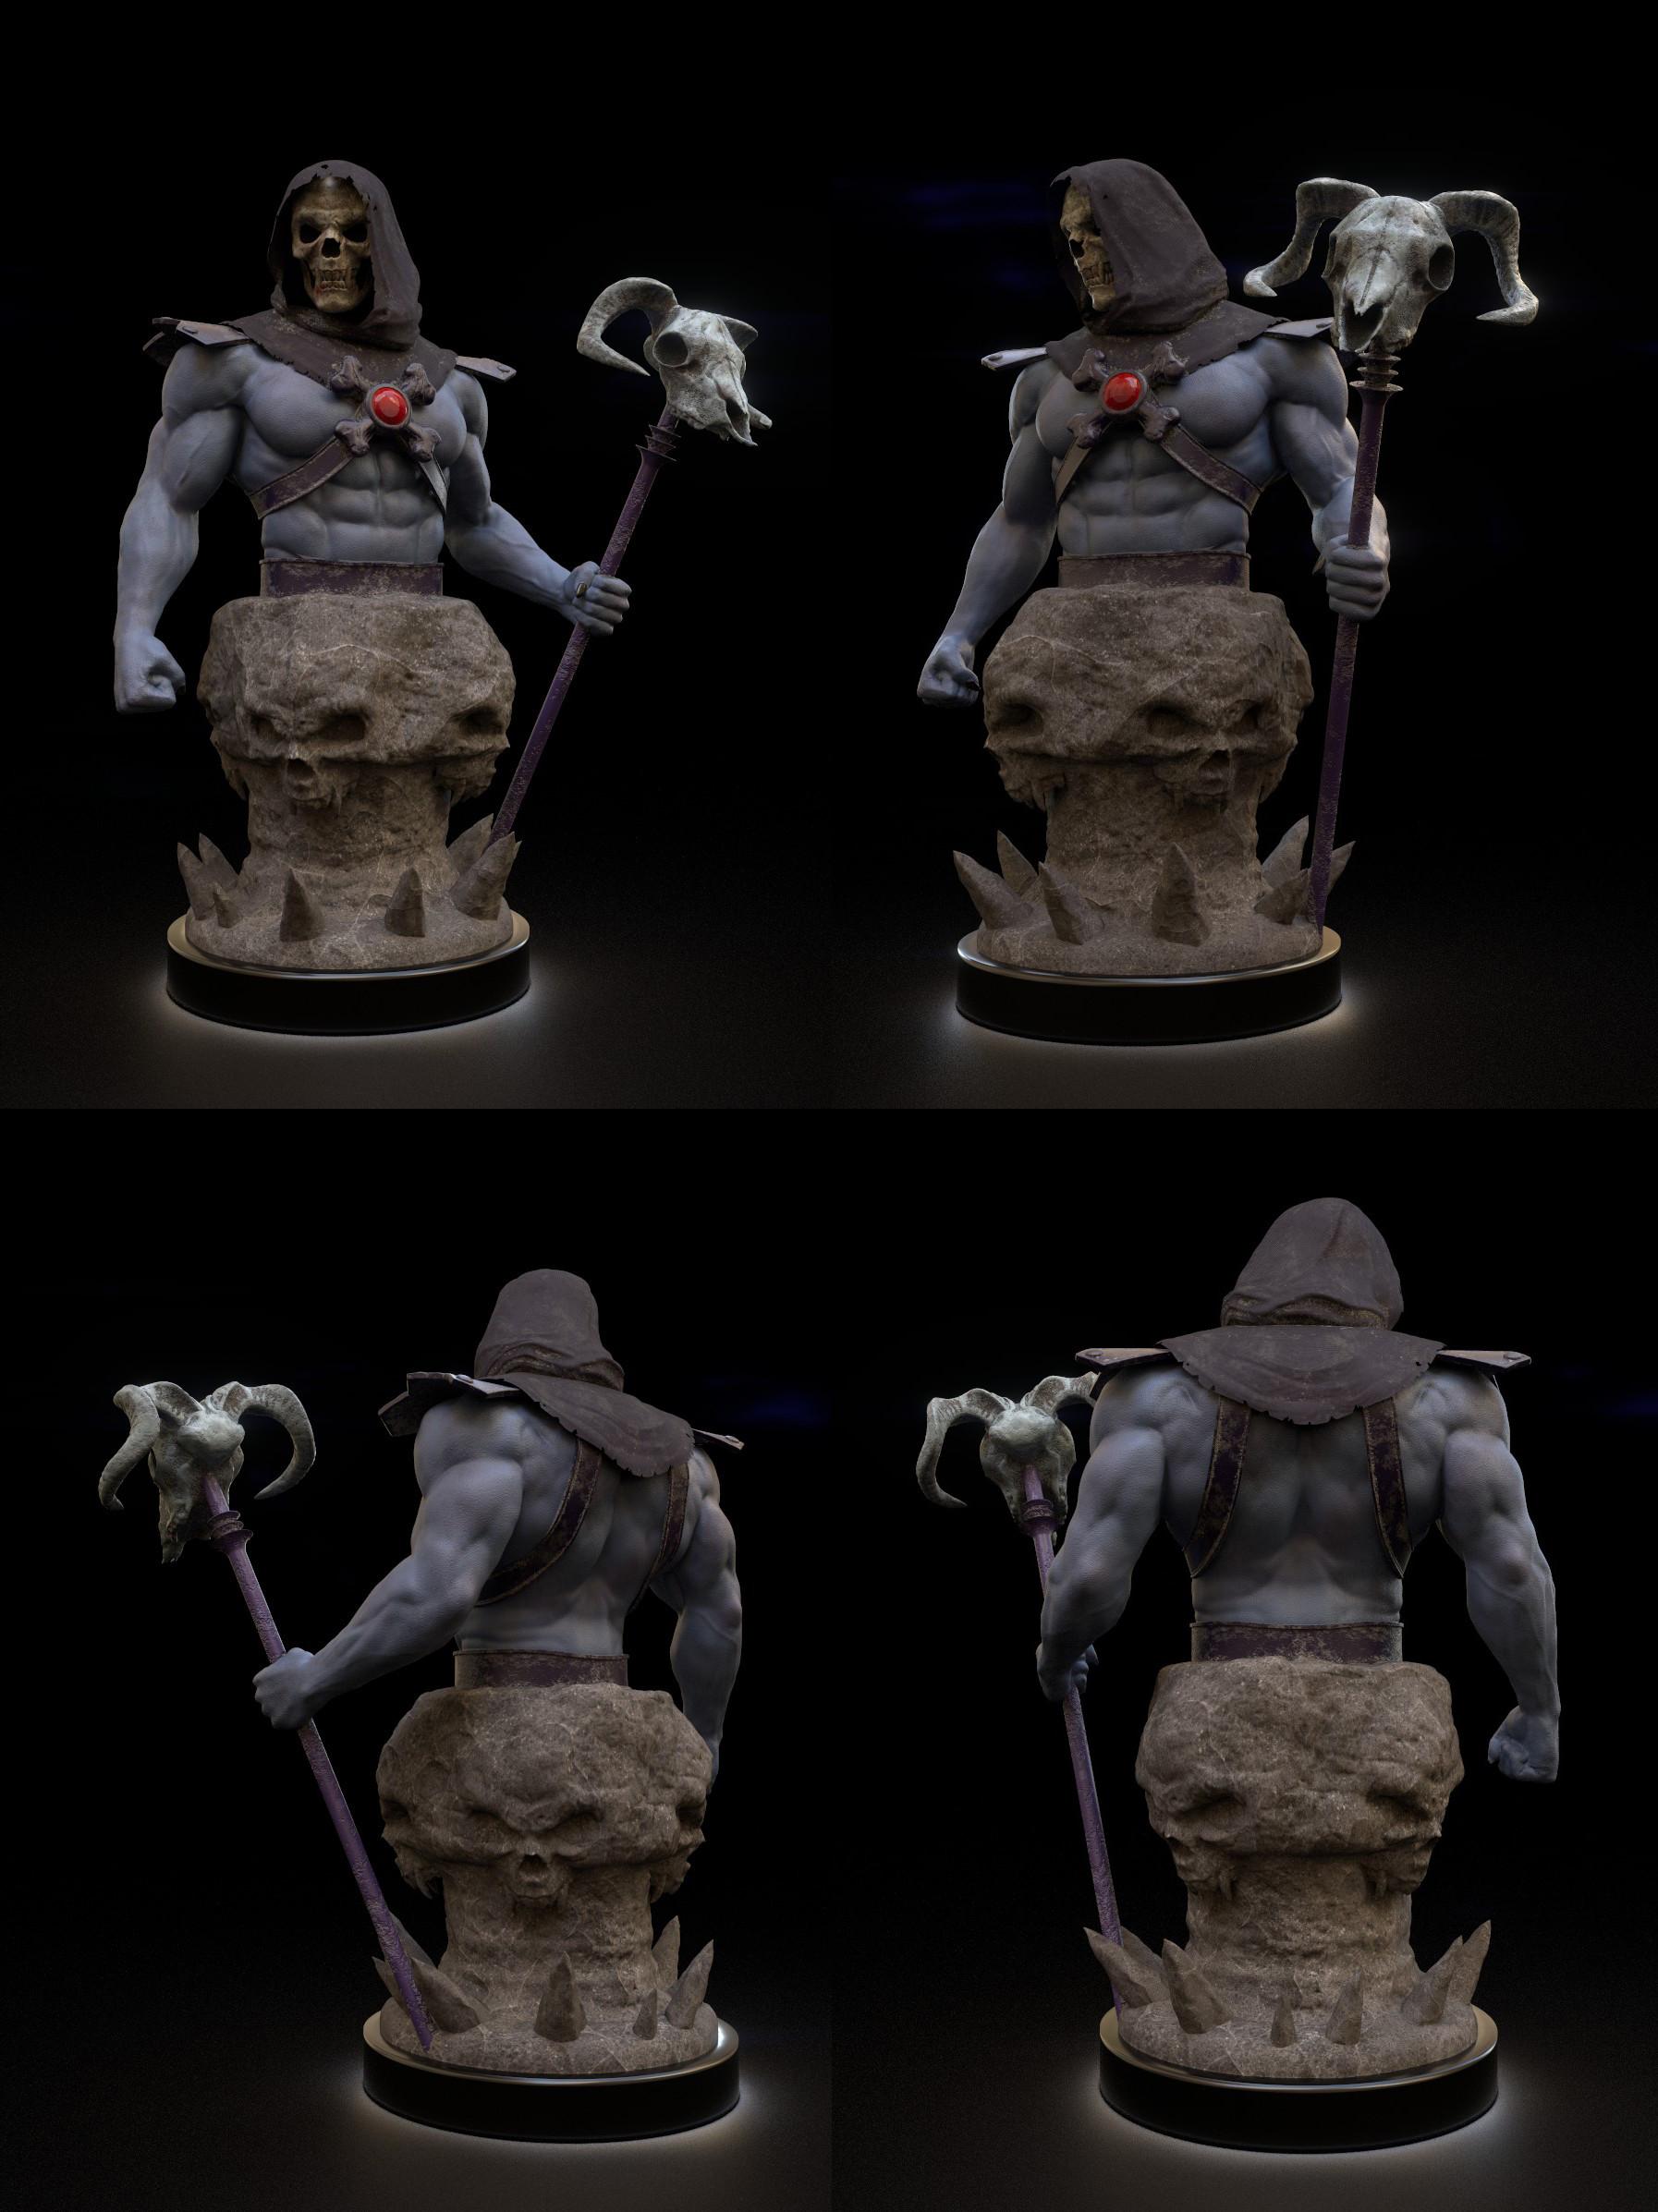 Edgar gomez skeletorvistas1